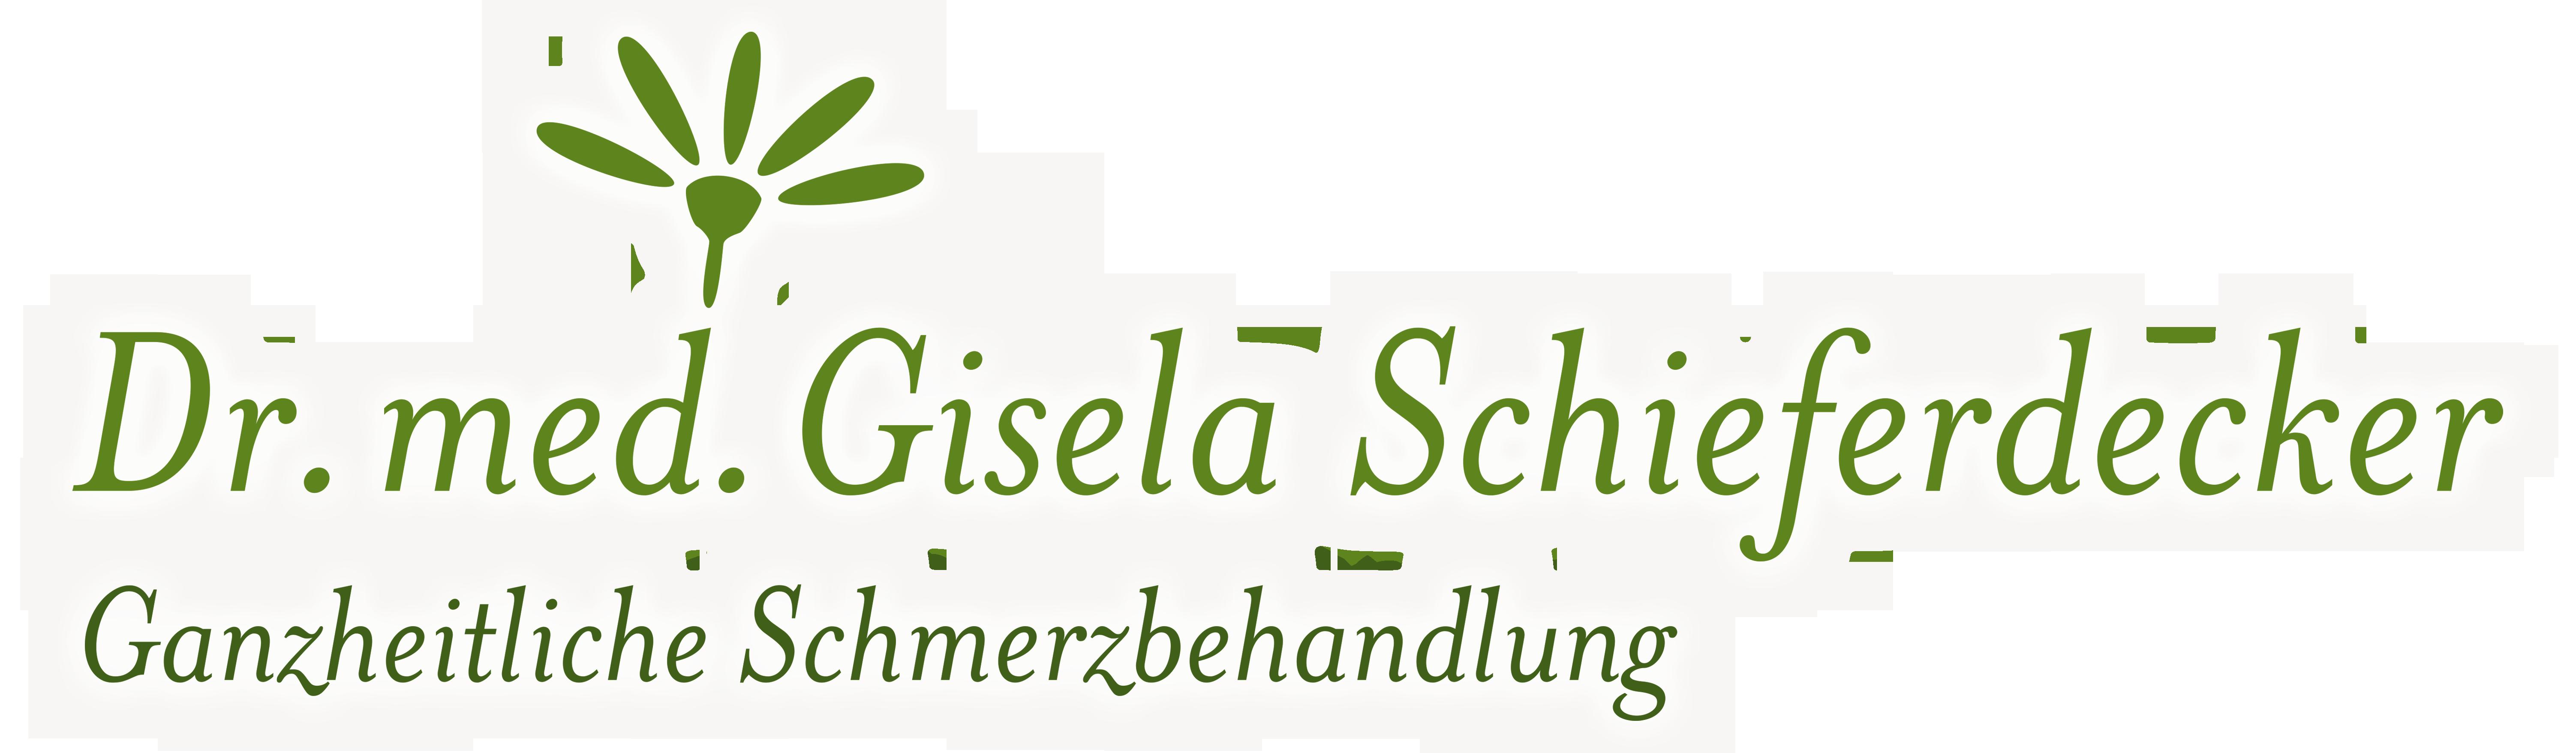 Dr. med. Gisela Schieferdecker